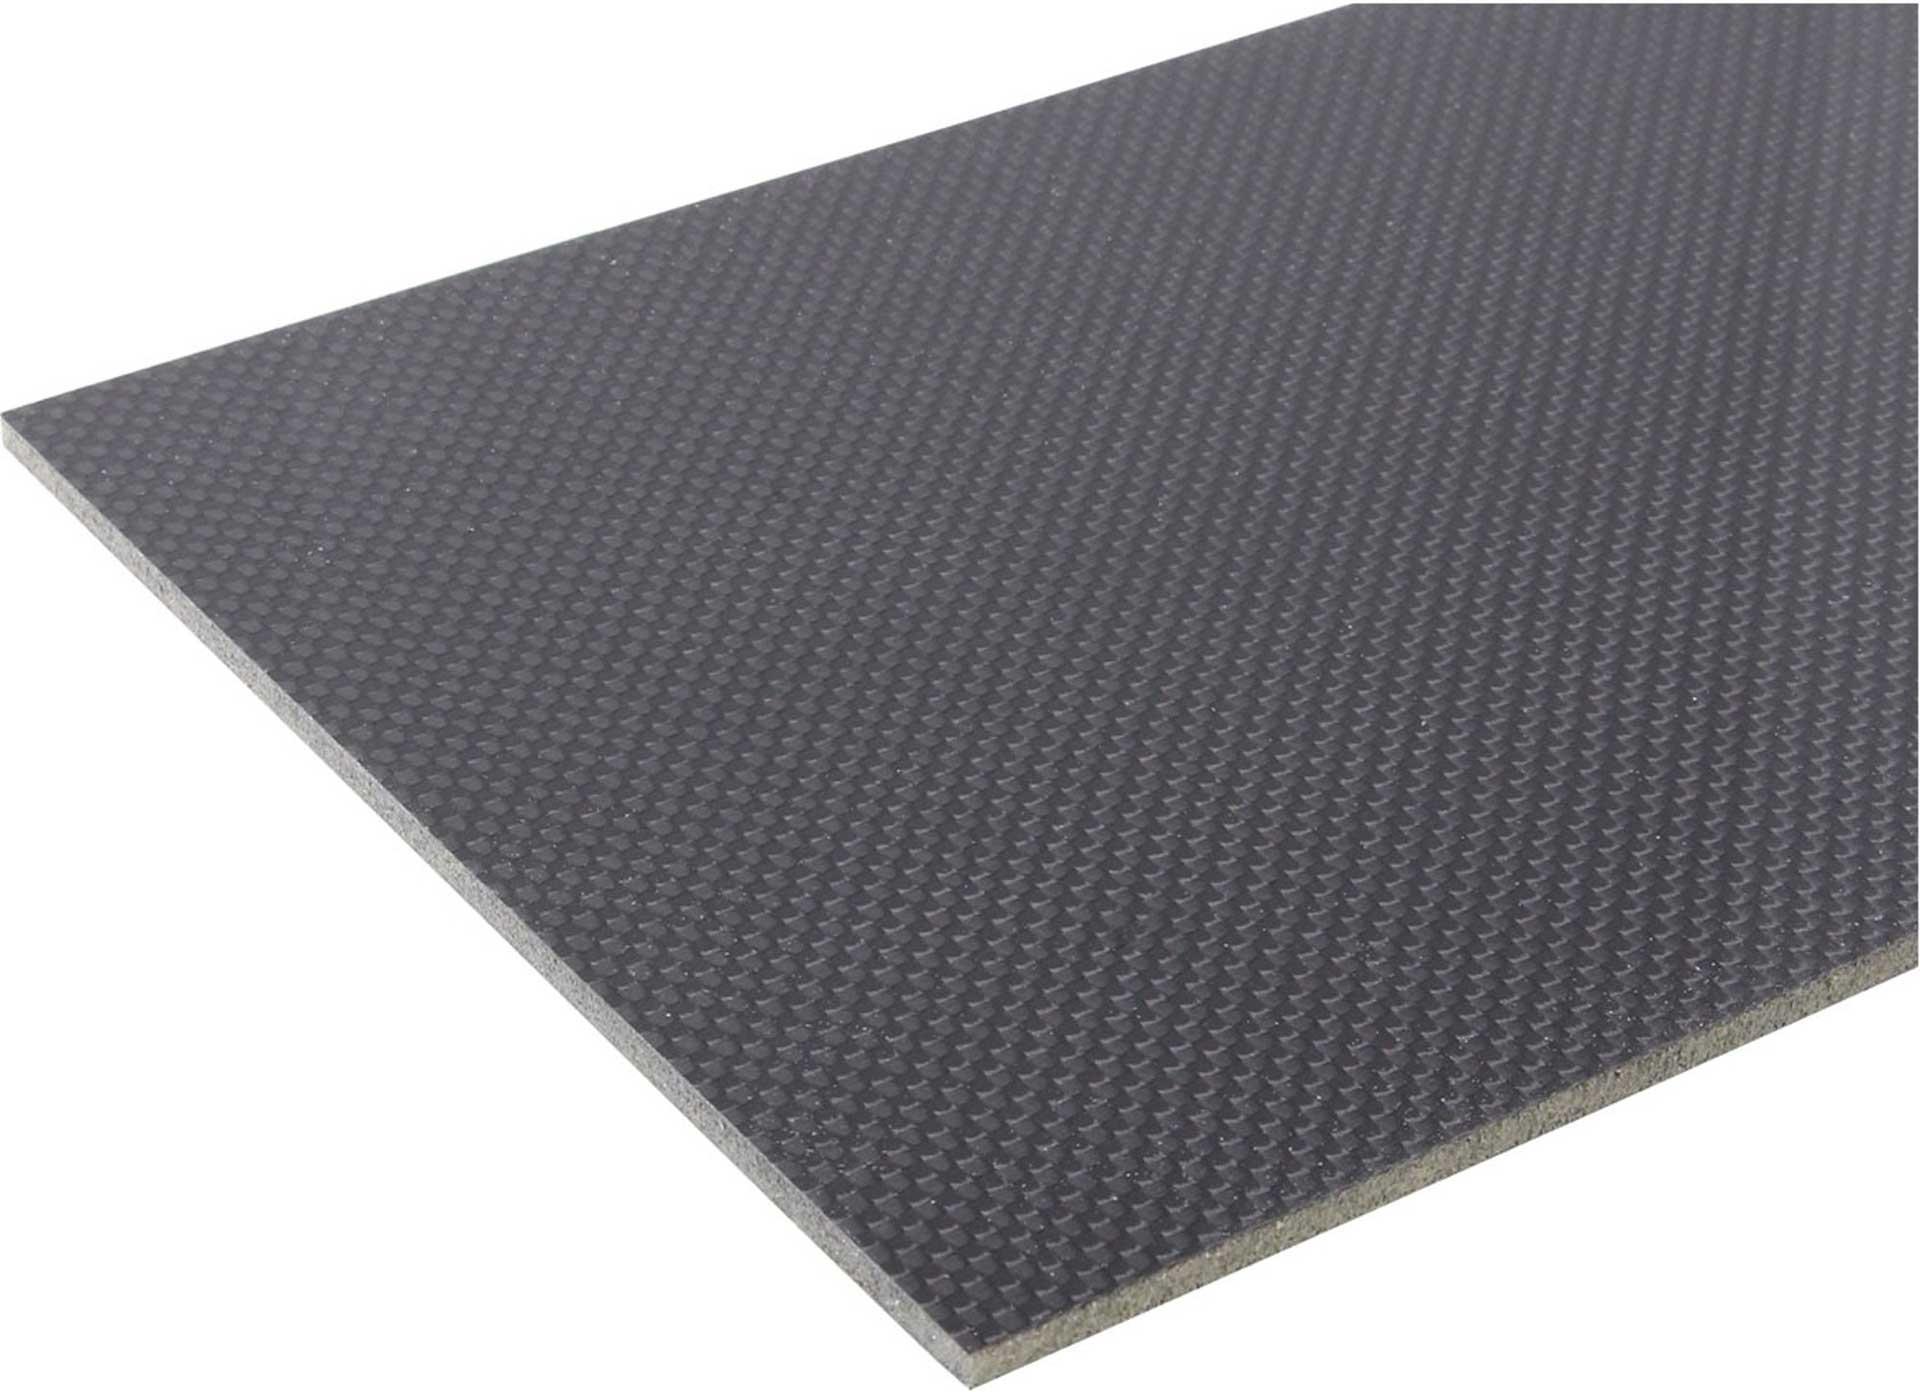 MODELLBAU LINDINGER CARBON-HEREX-CARBON PLATTE 300/160/6,0MM